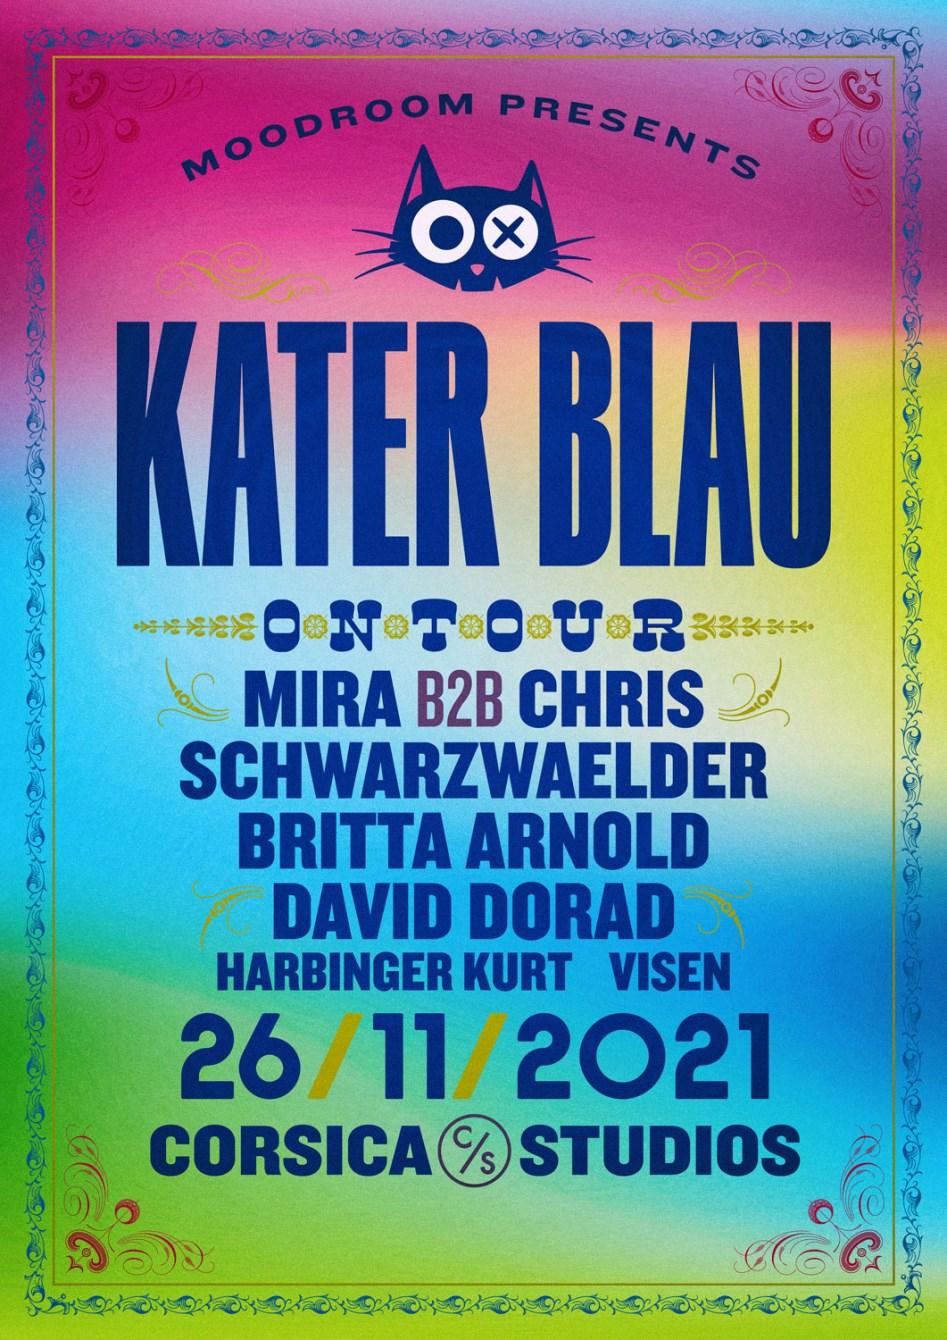 Moodroom x Kater Blau: Mira b2b Chris Schwarzwälder (4 hrs), Britta Arnold, David Dorad - Flyer back